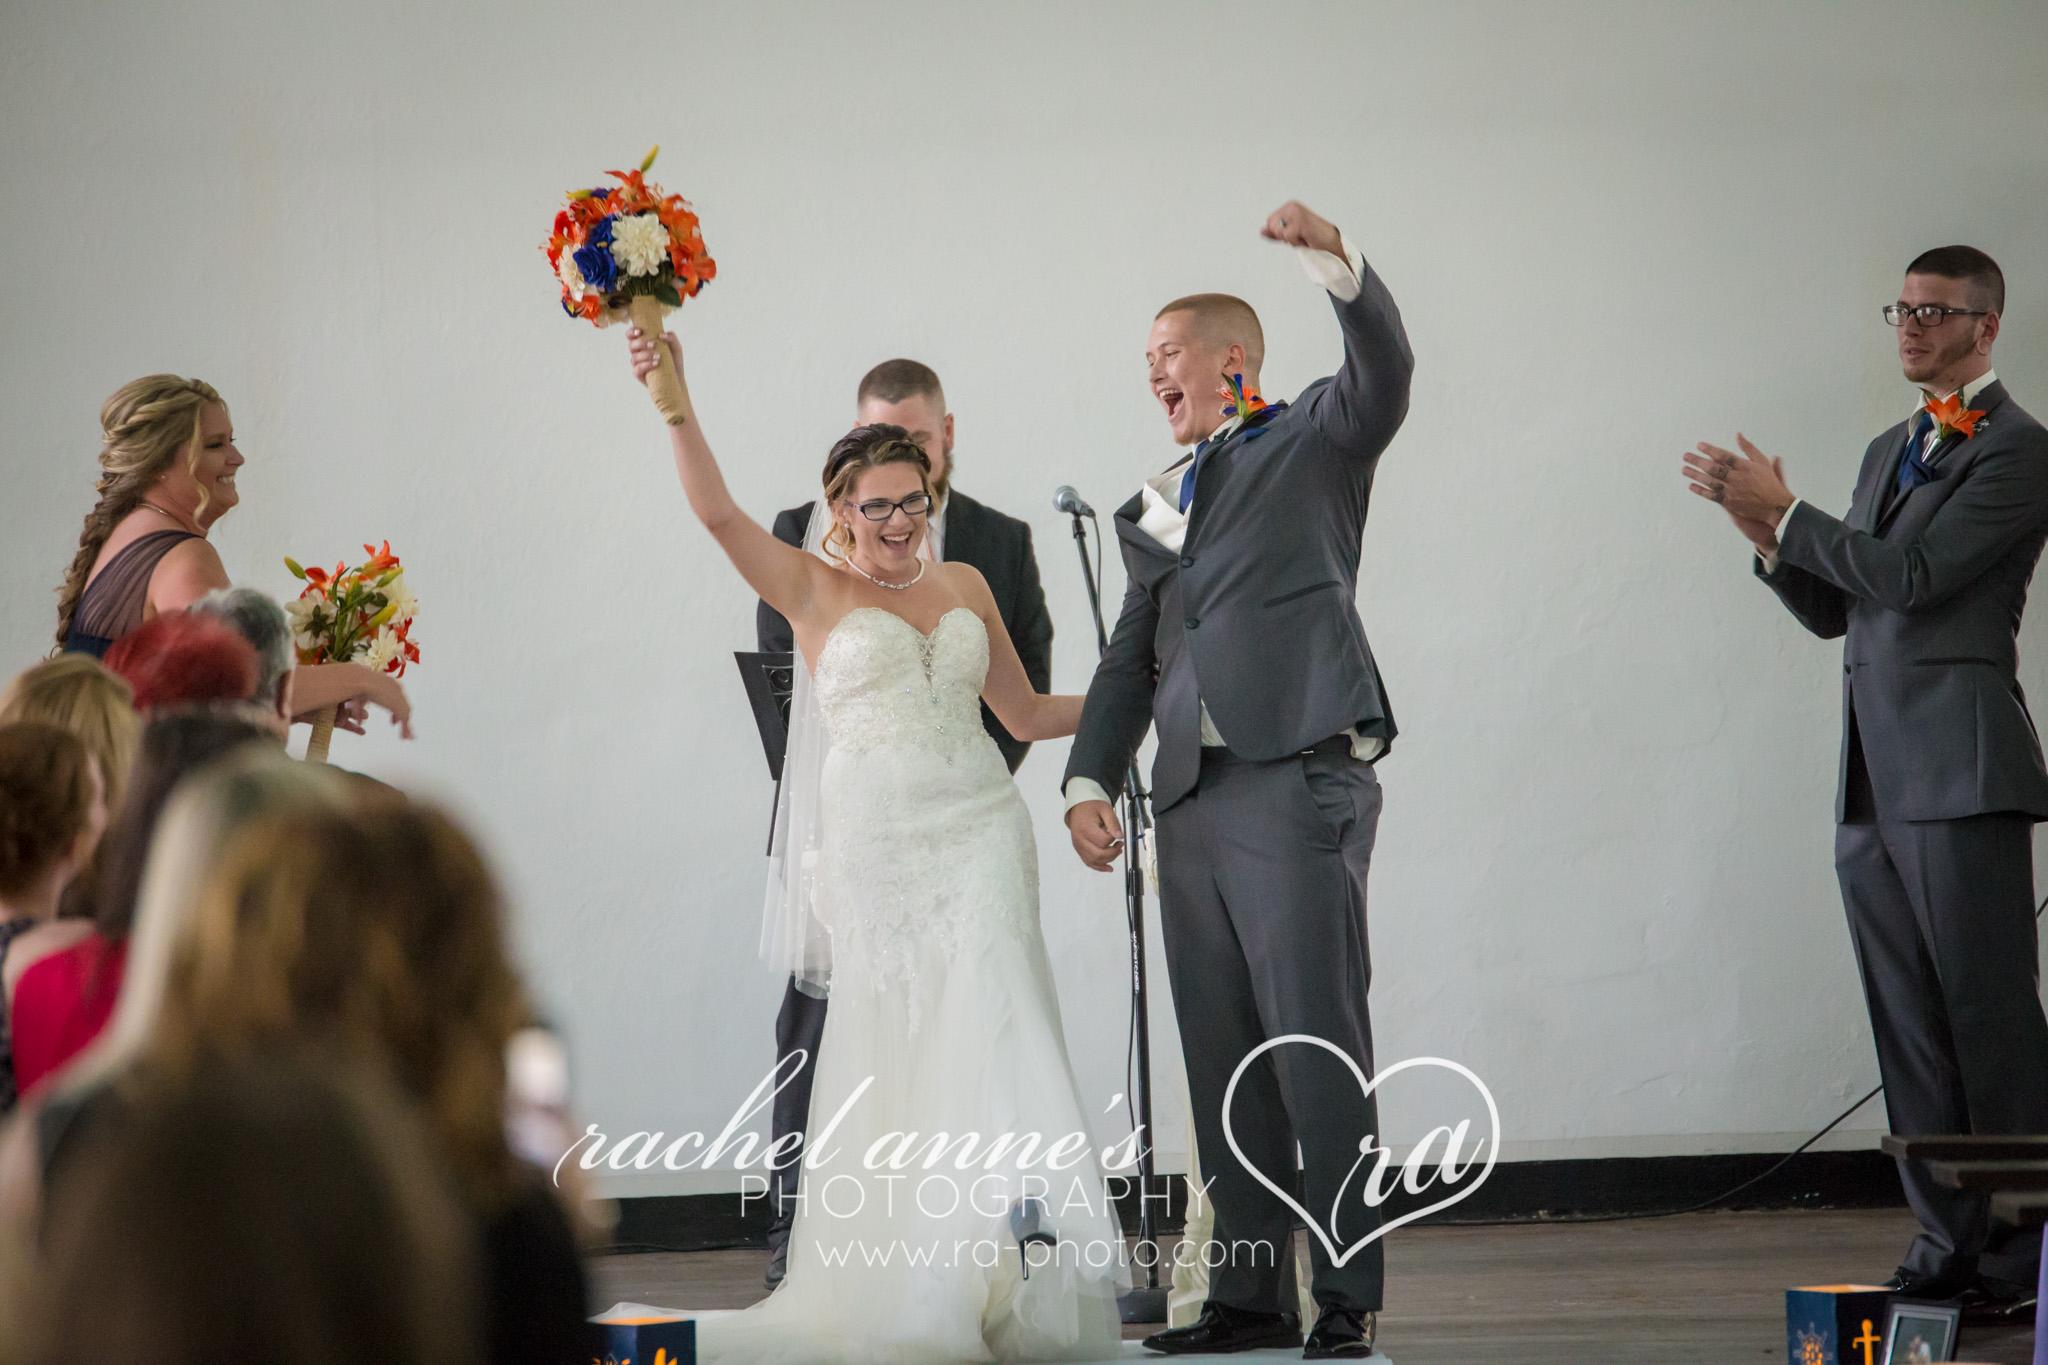 042-JCM-OLD-ECONOMY-VILLAGE-THE-FEZ-PA-WEDDINGS.jpg